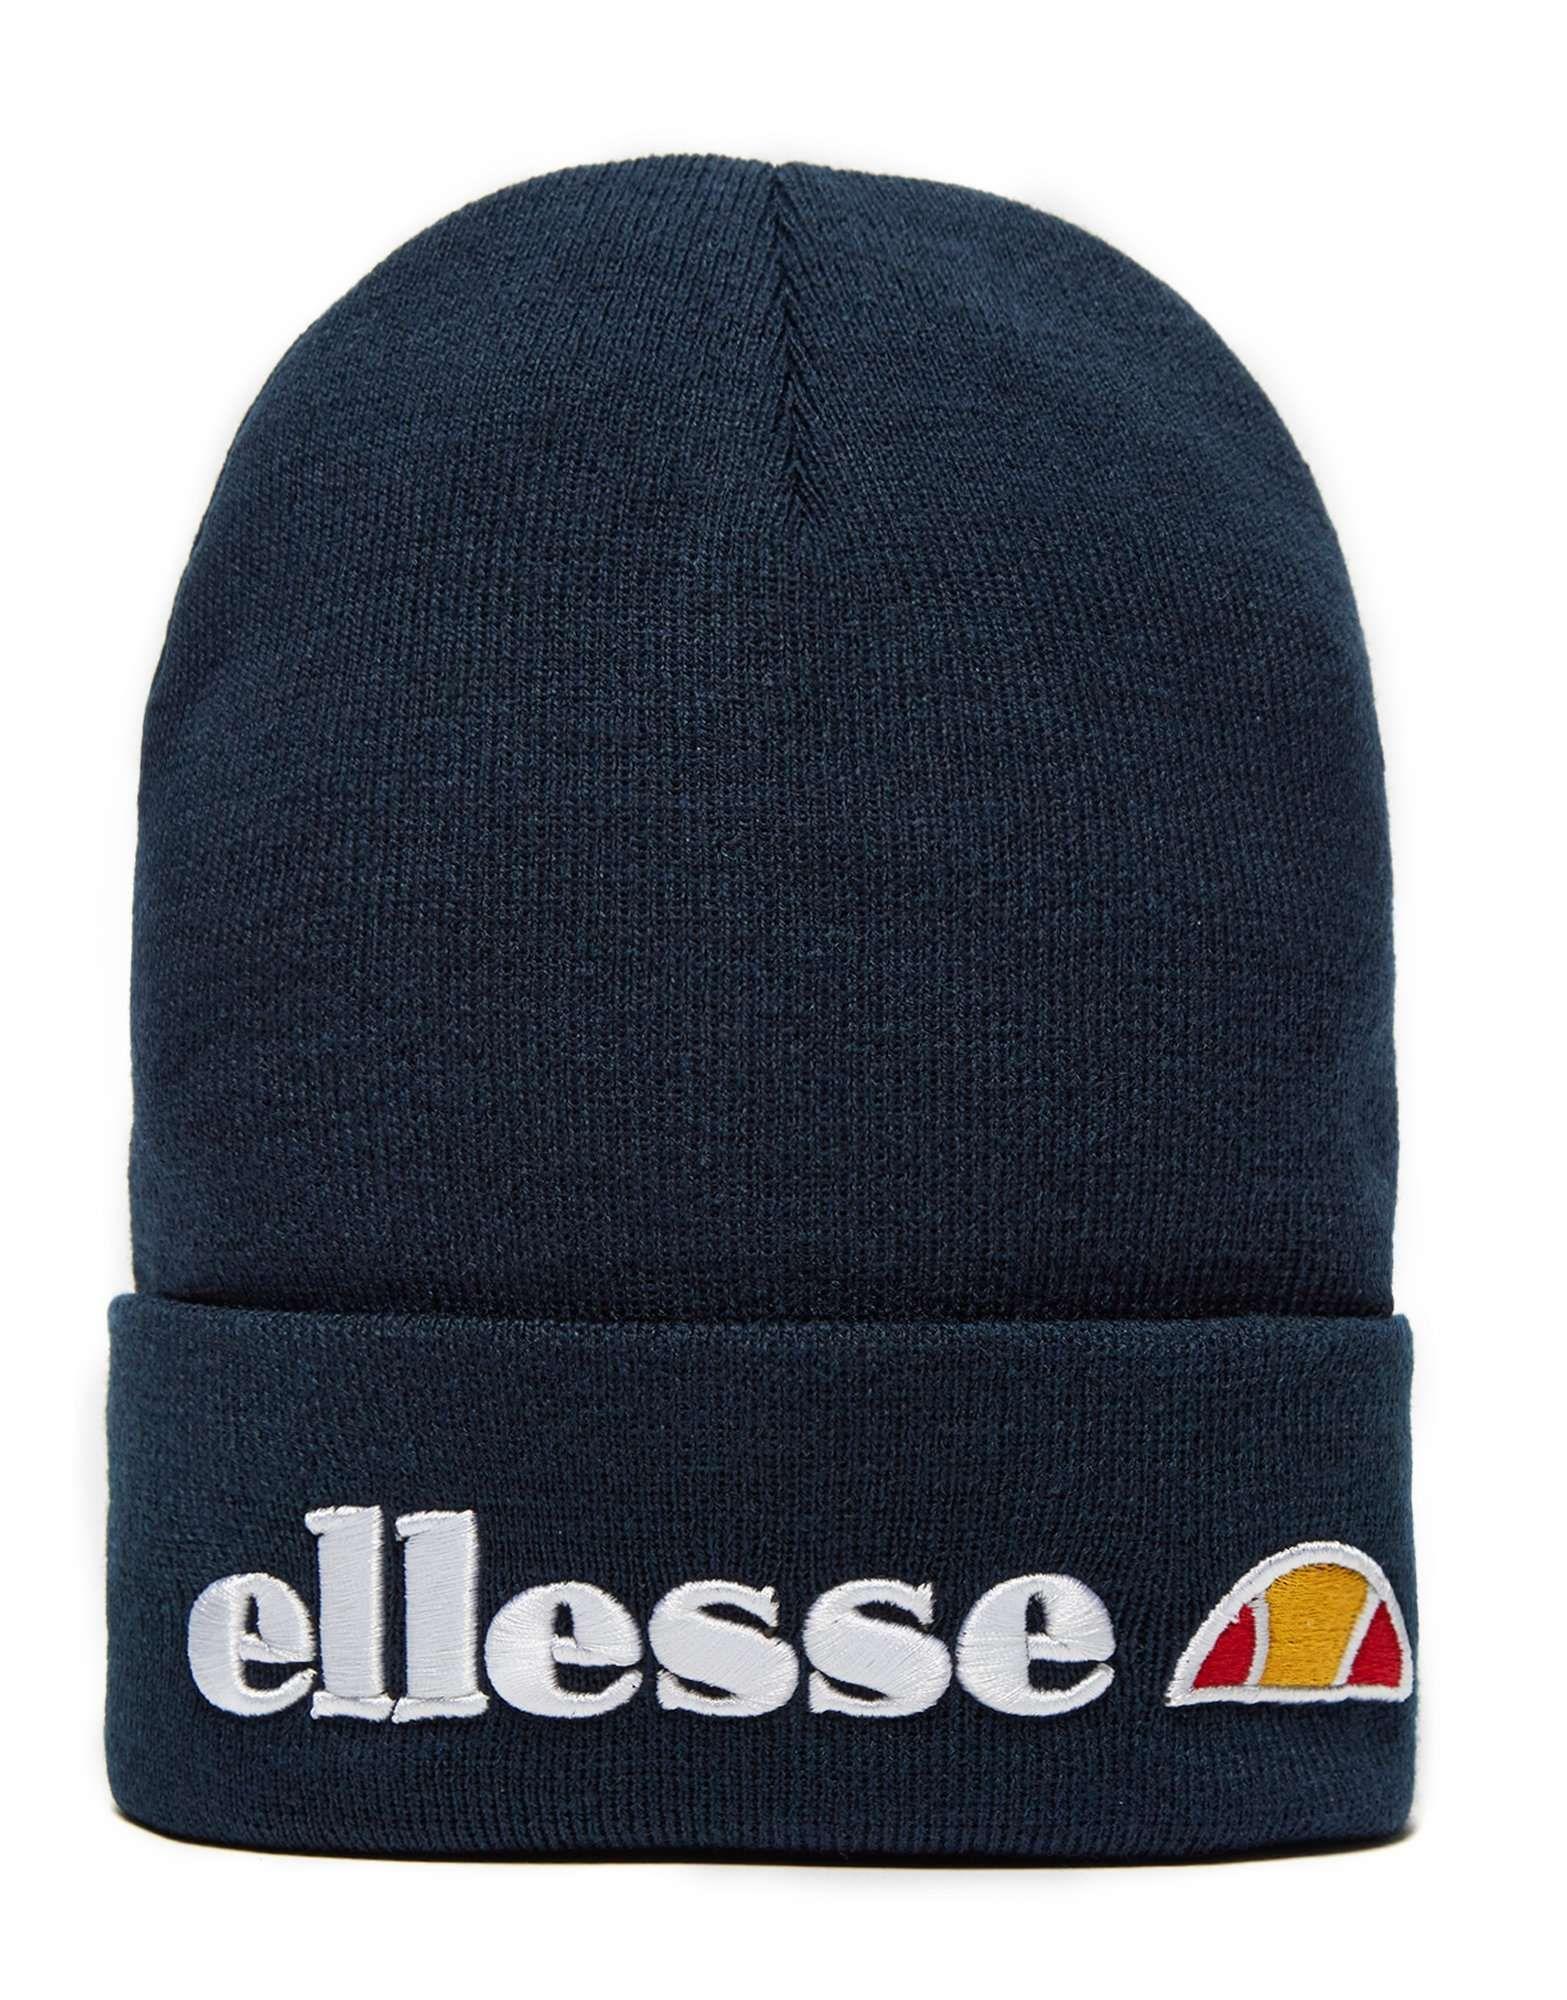 Ellesse Verona Beanie Hat - Shop online for Ellesse Verona Beanie Hat with JD  Sports 095eb3f1c9d